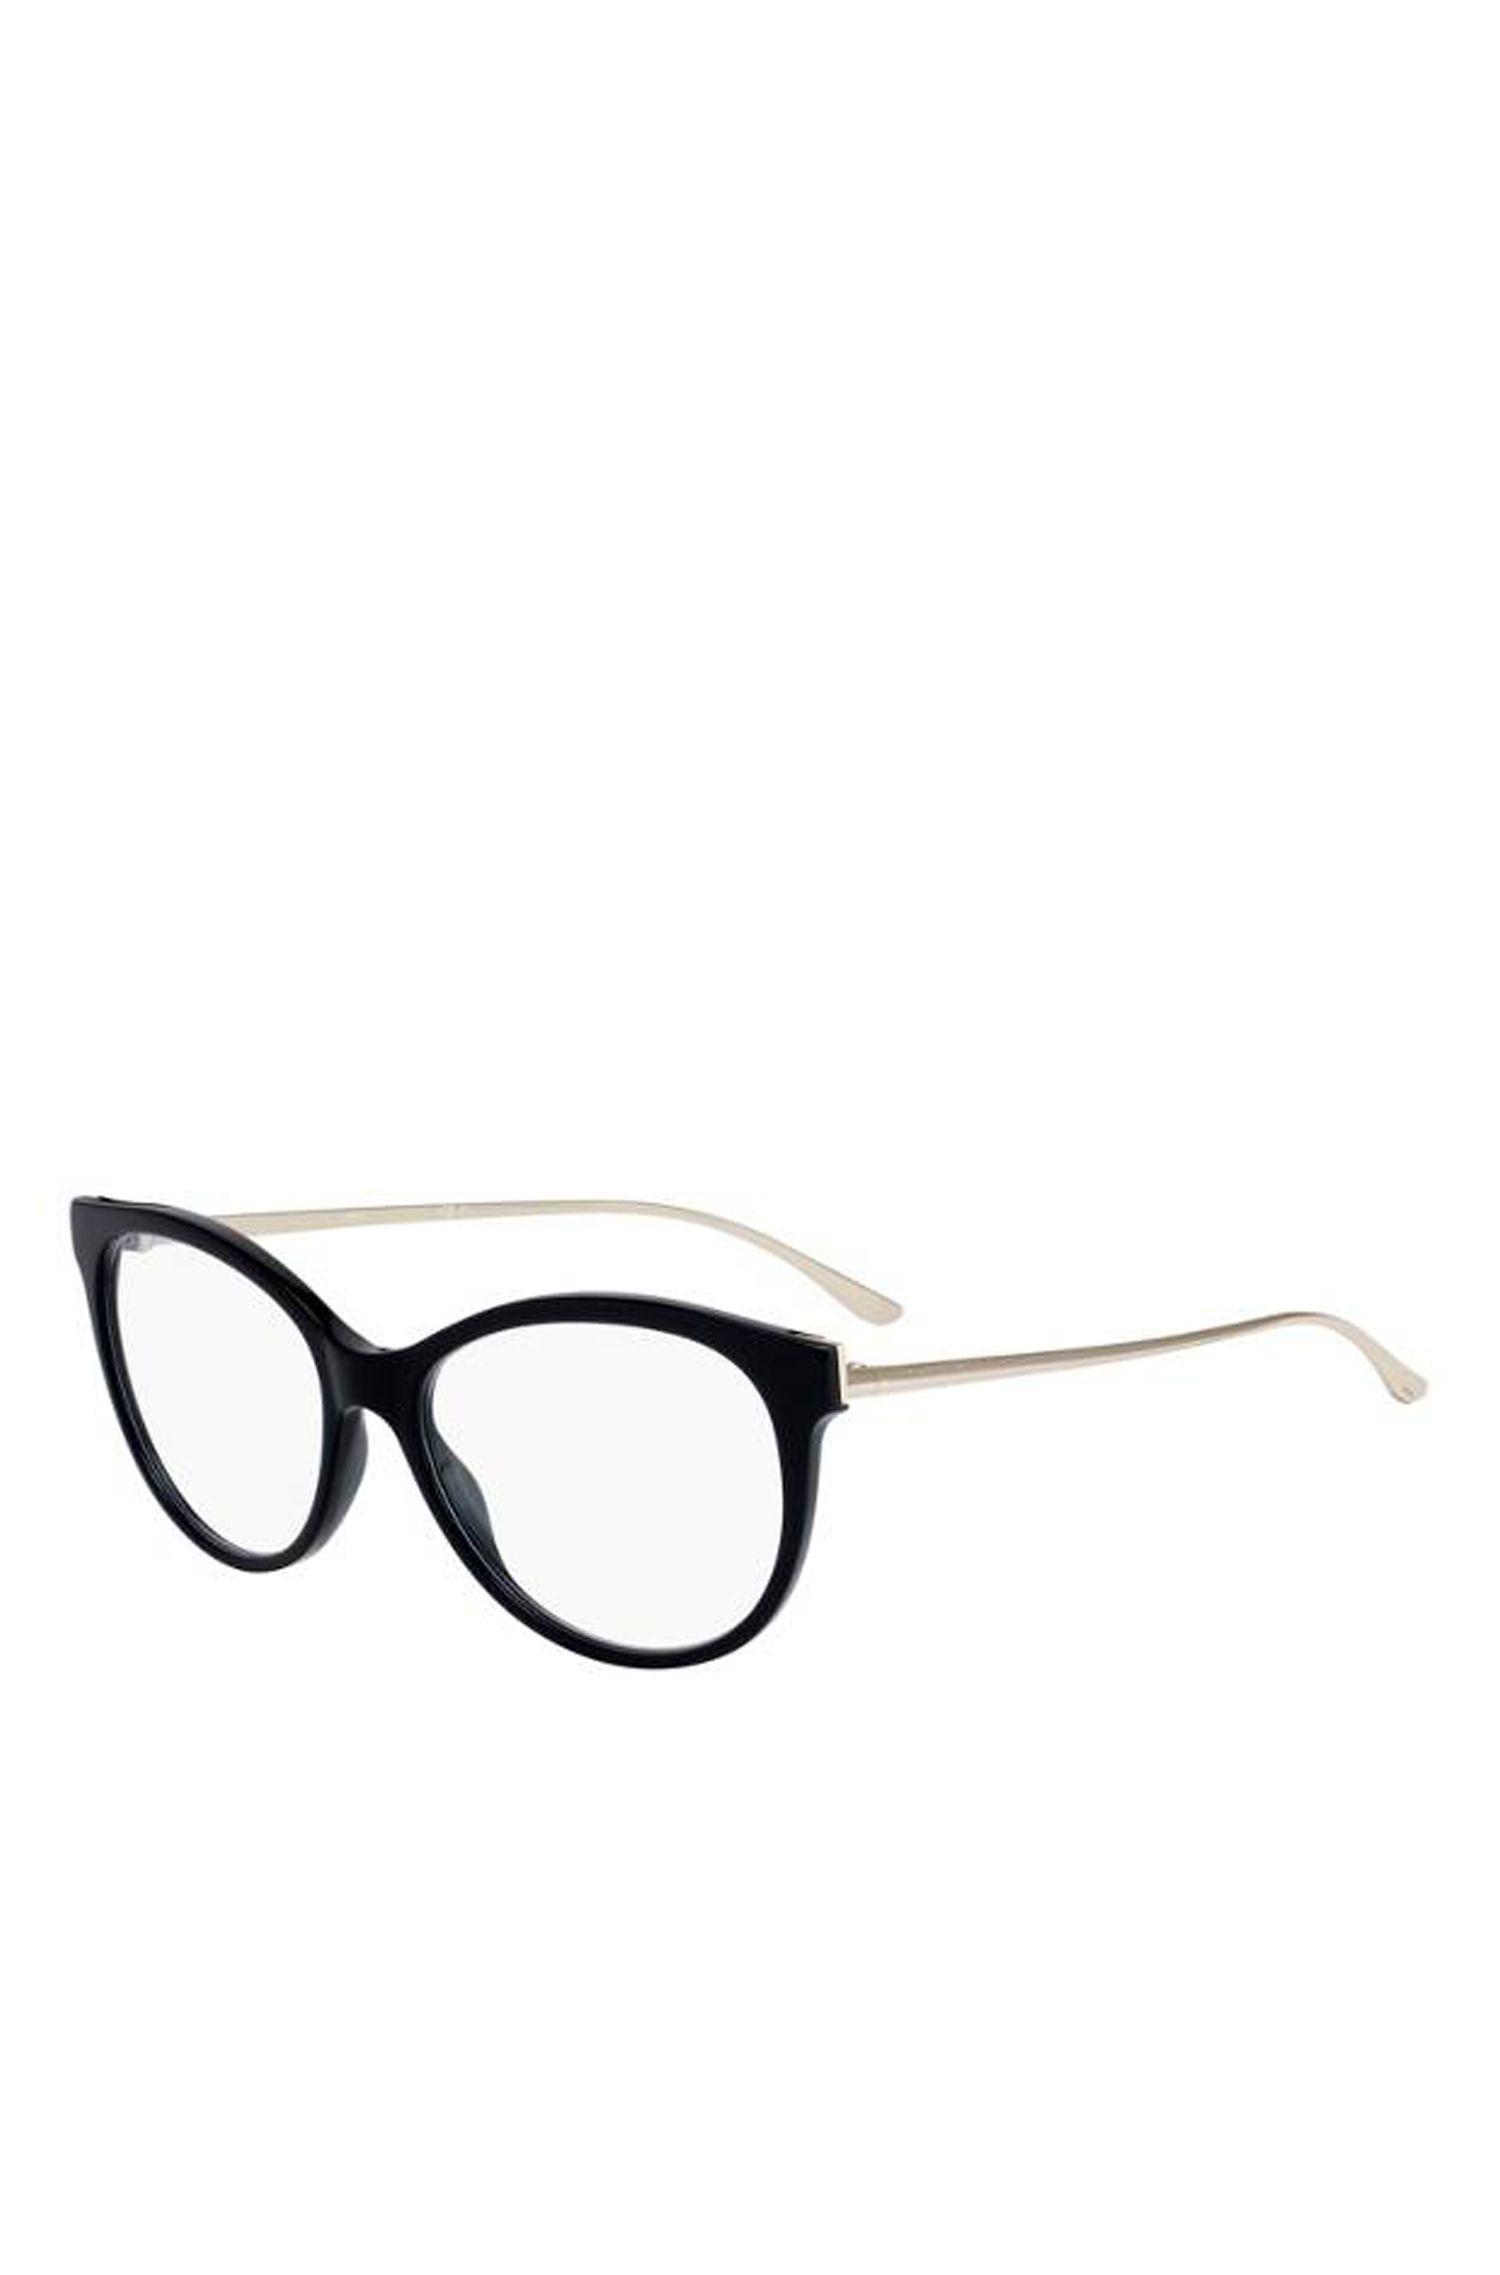 Black Acetate Cat-Eye Optical Frames | BOSS 0894 RHP